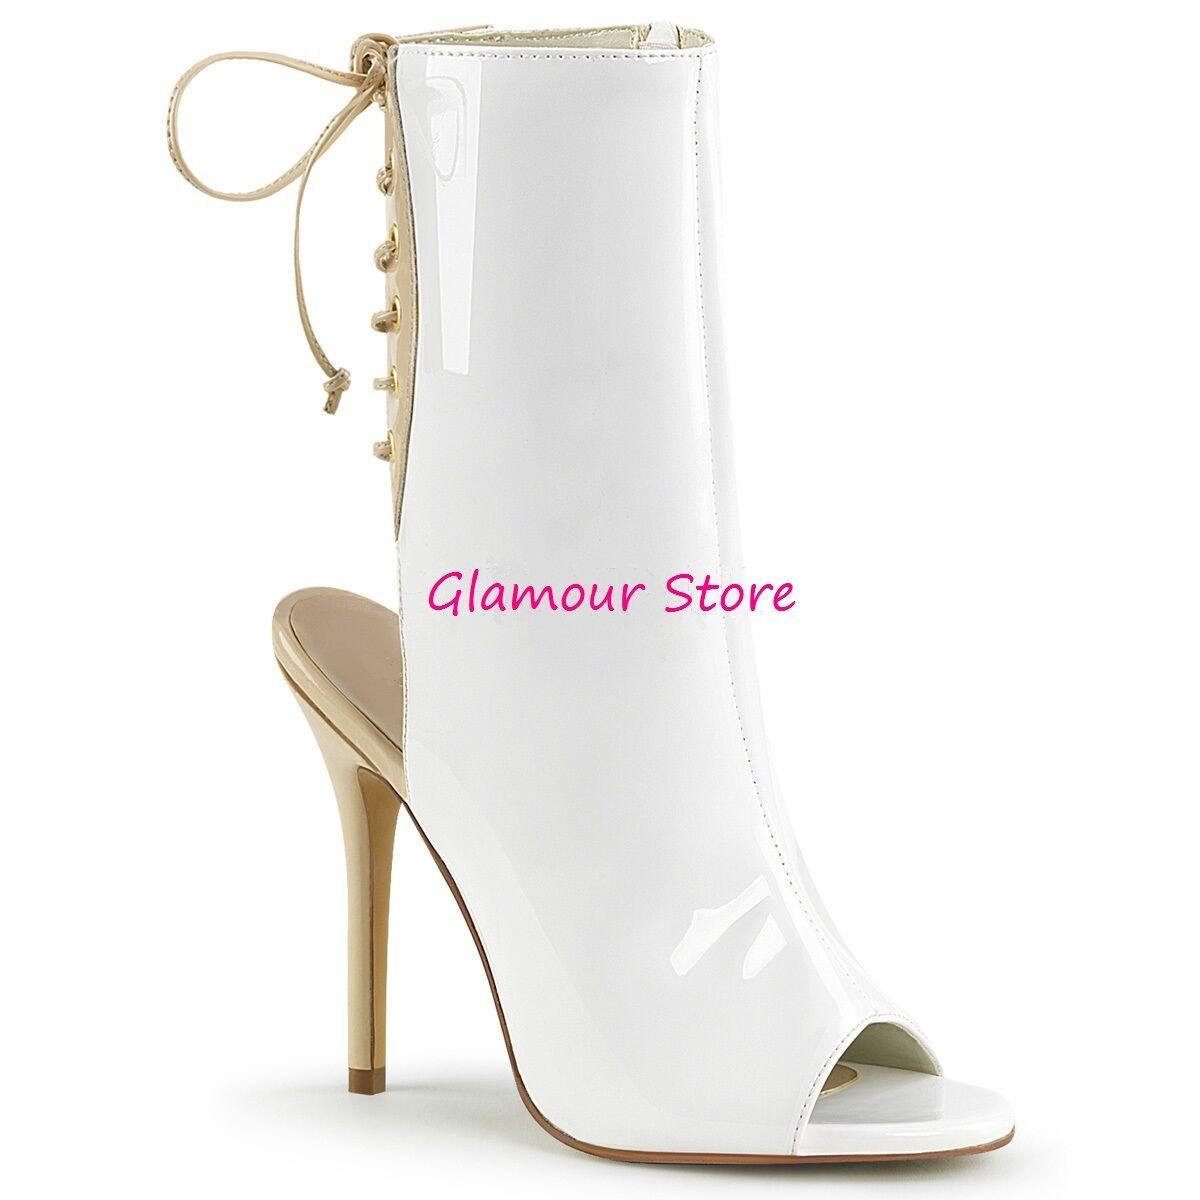 Sexy STIVALETTI BIANCHI APERTI tacco 13 sandali dal 35 al 44 scarpe GLAMOUR